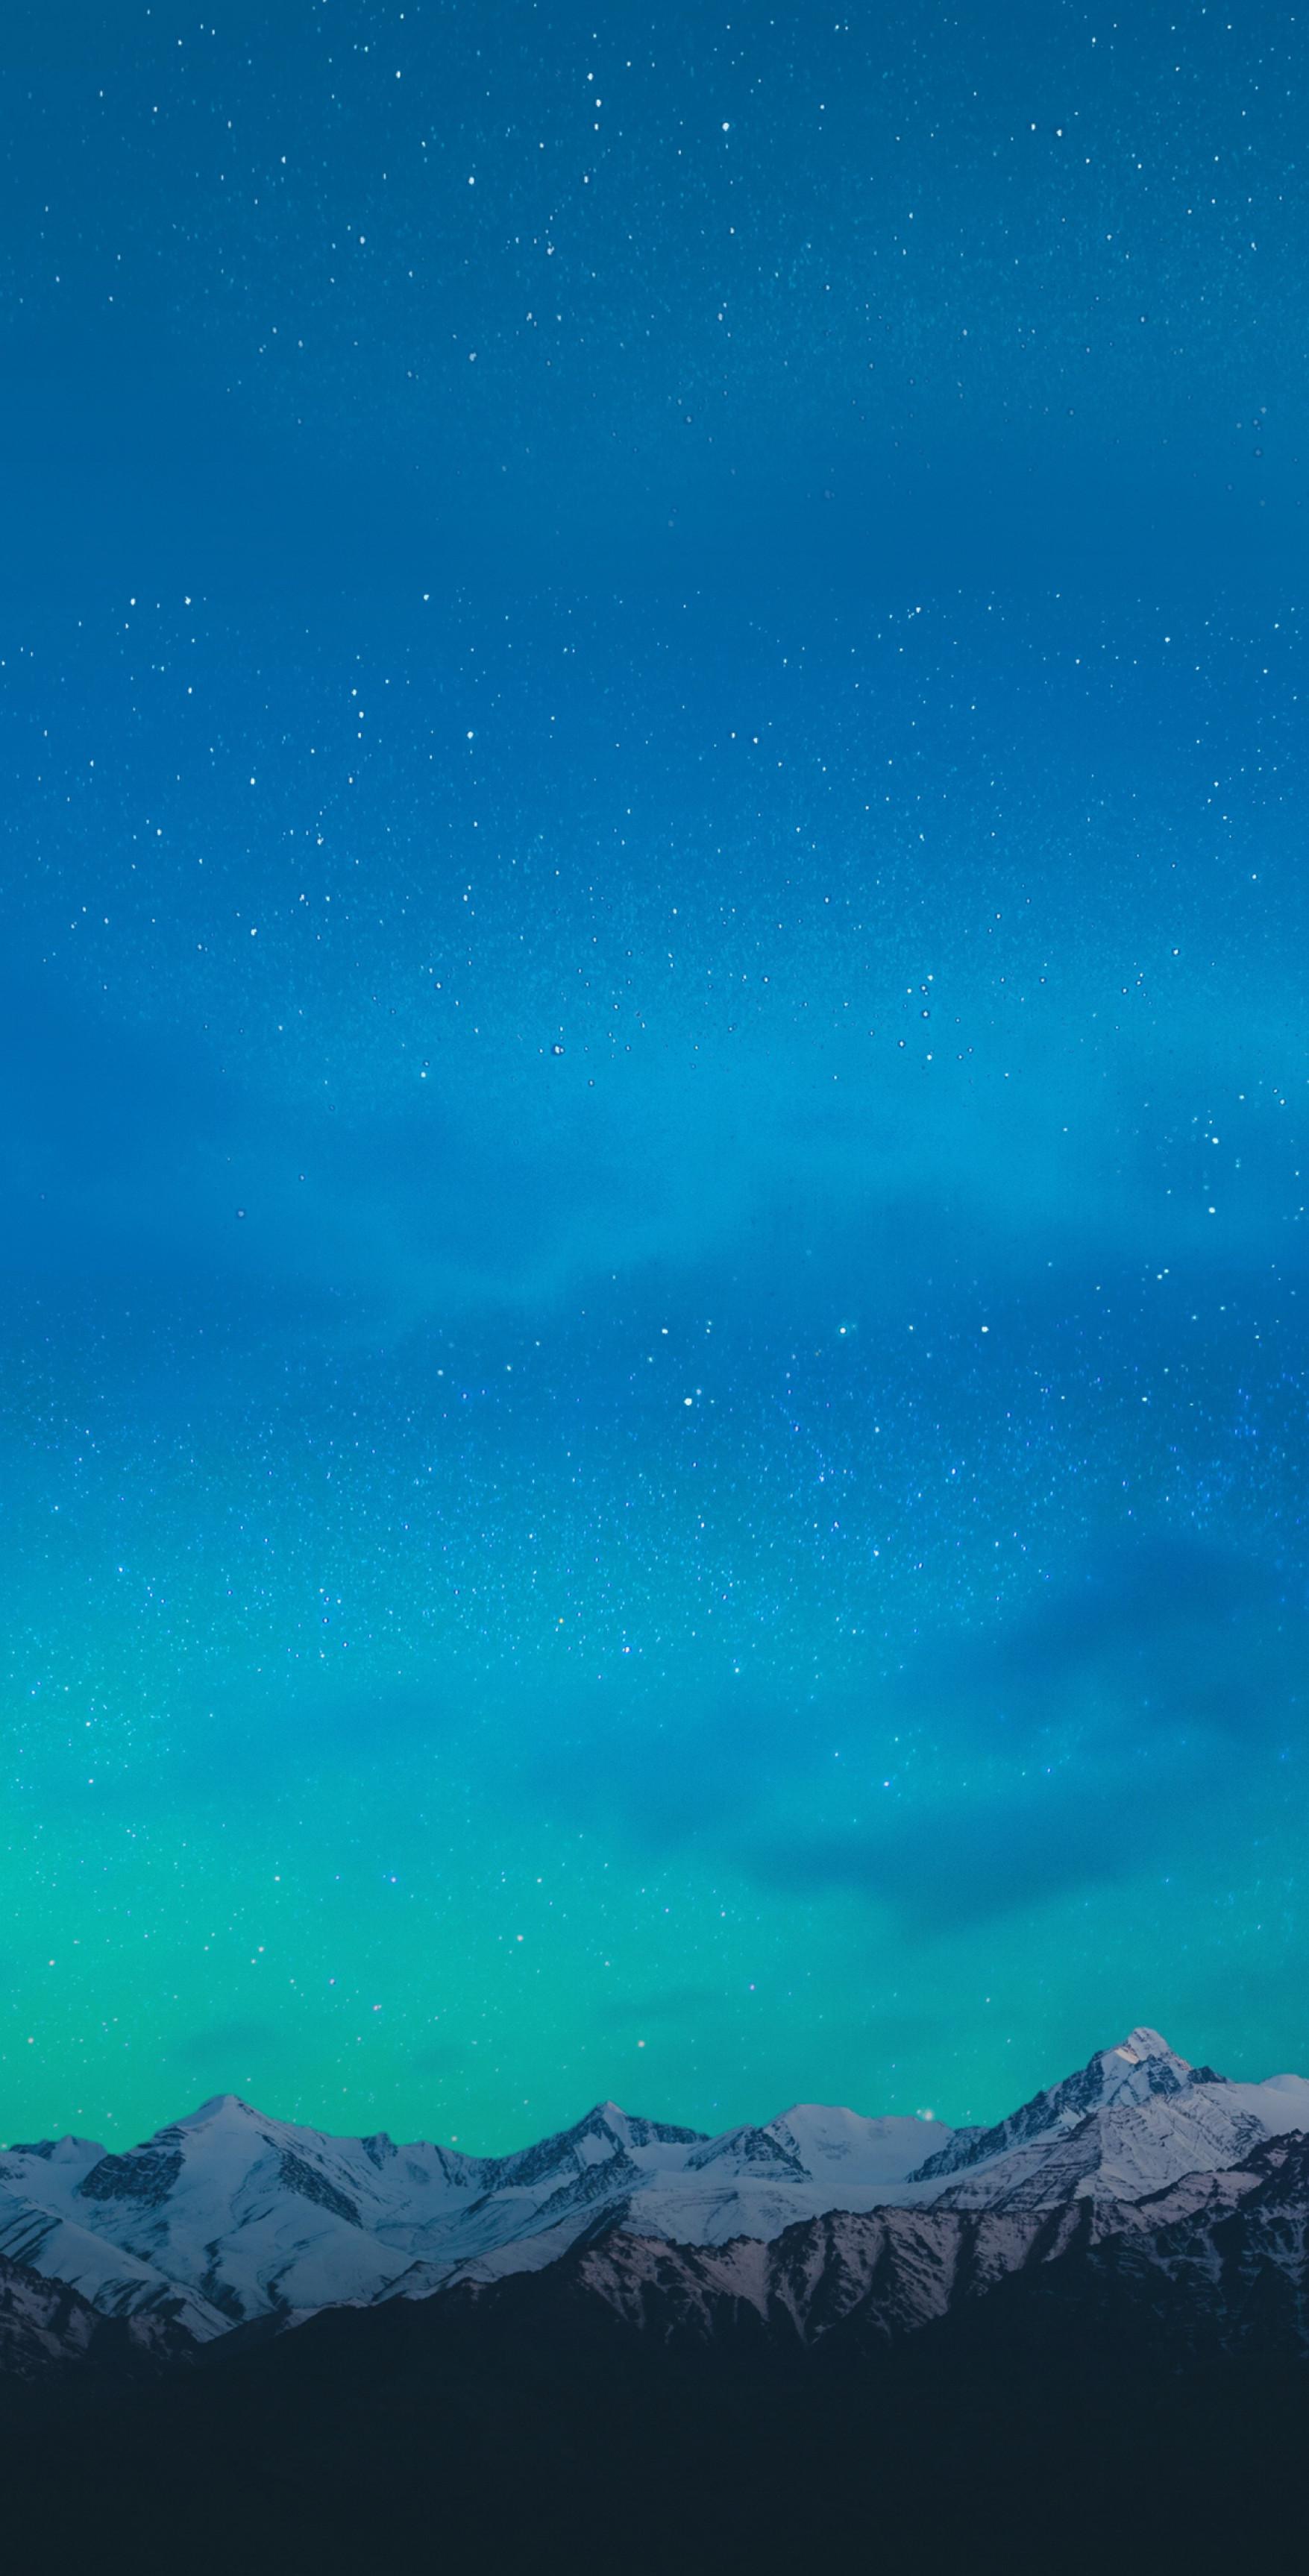 Mountain, aqua, wallpaper, galaxy, tranquil, beauty, nature, peaceful,